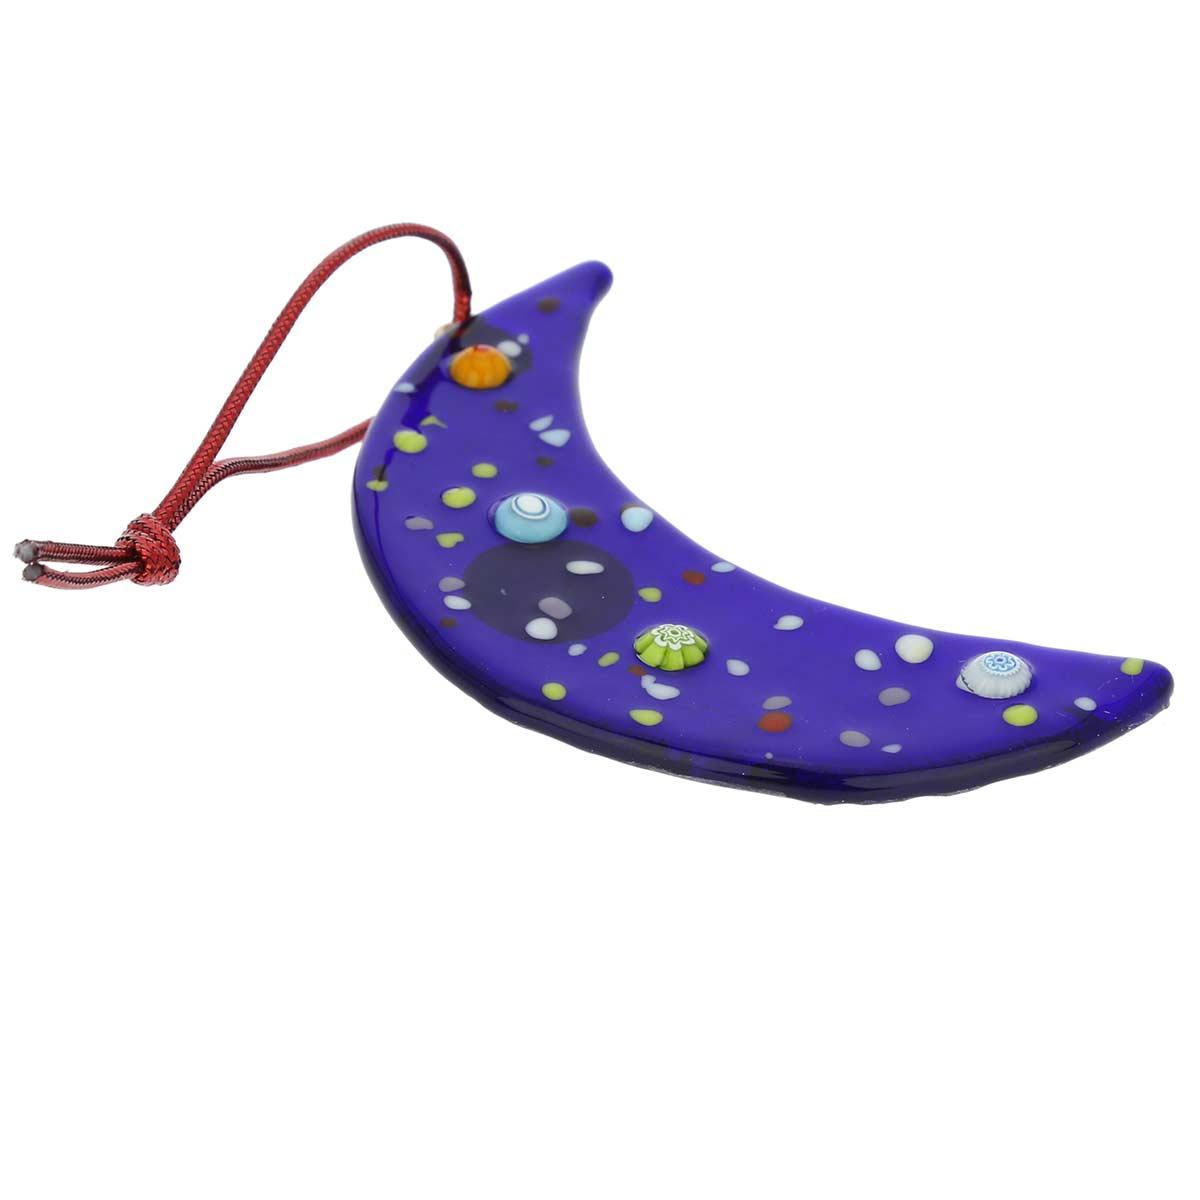 Murano Glass Moon Christmas Ornament - Blue